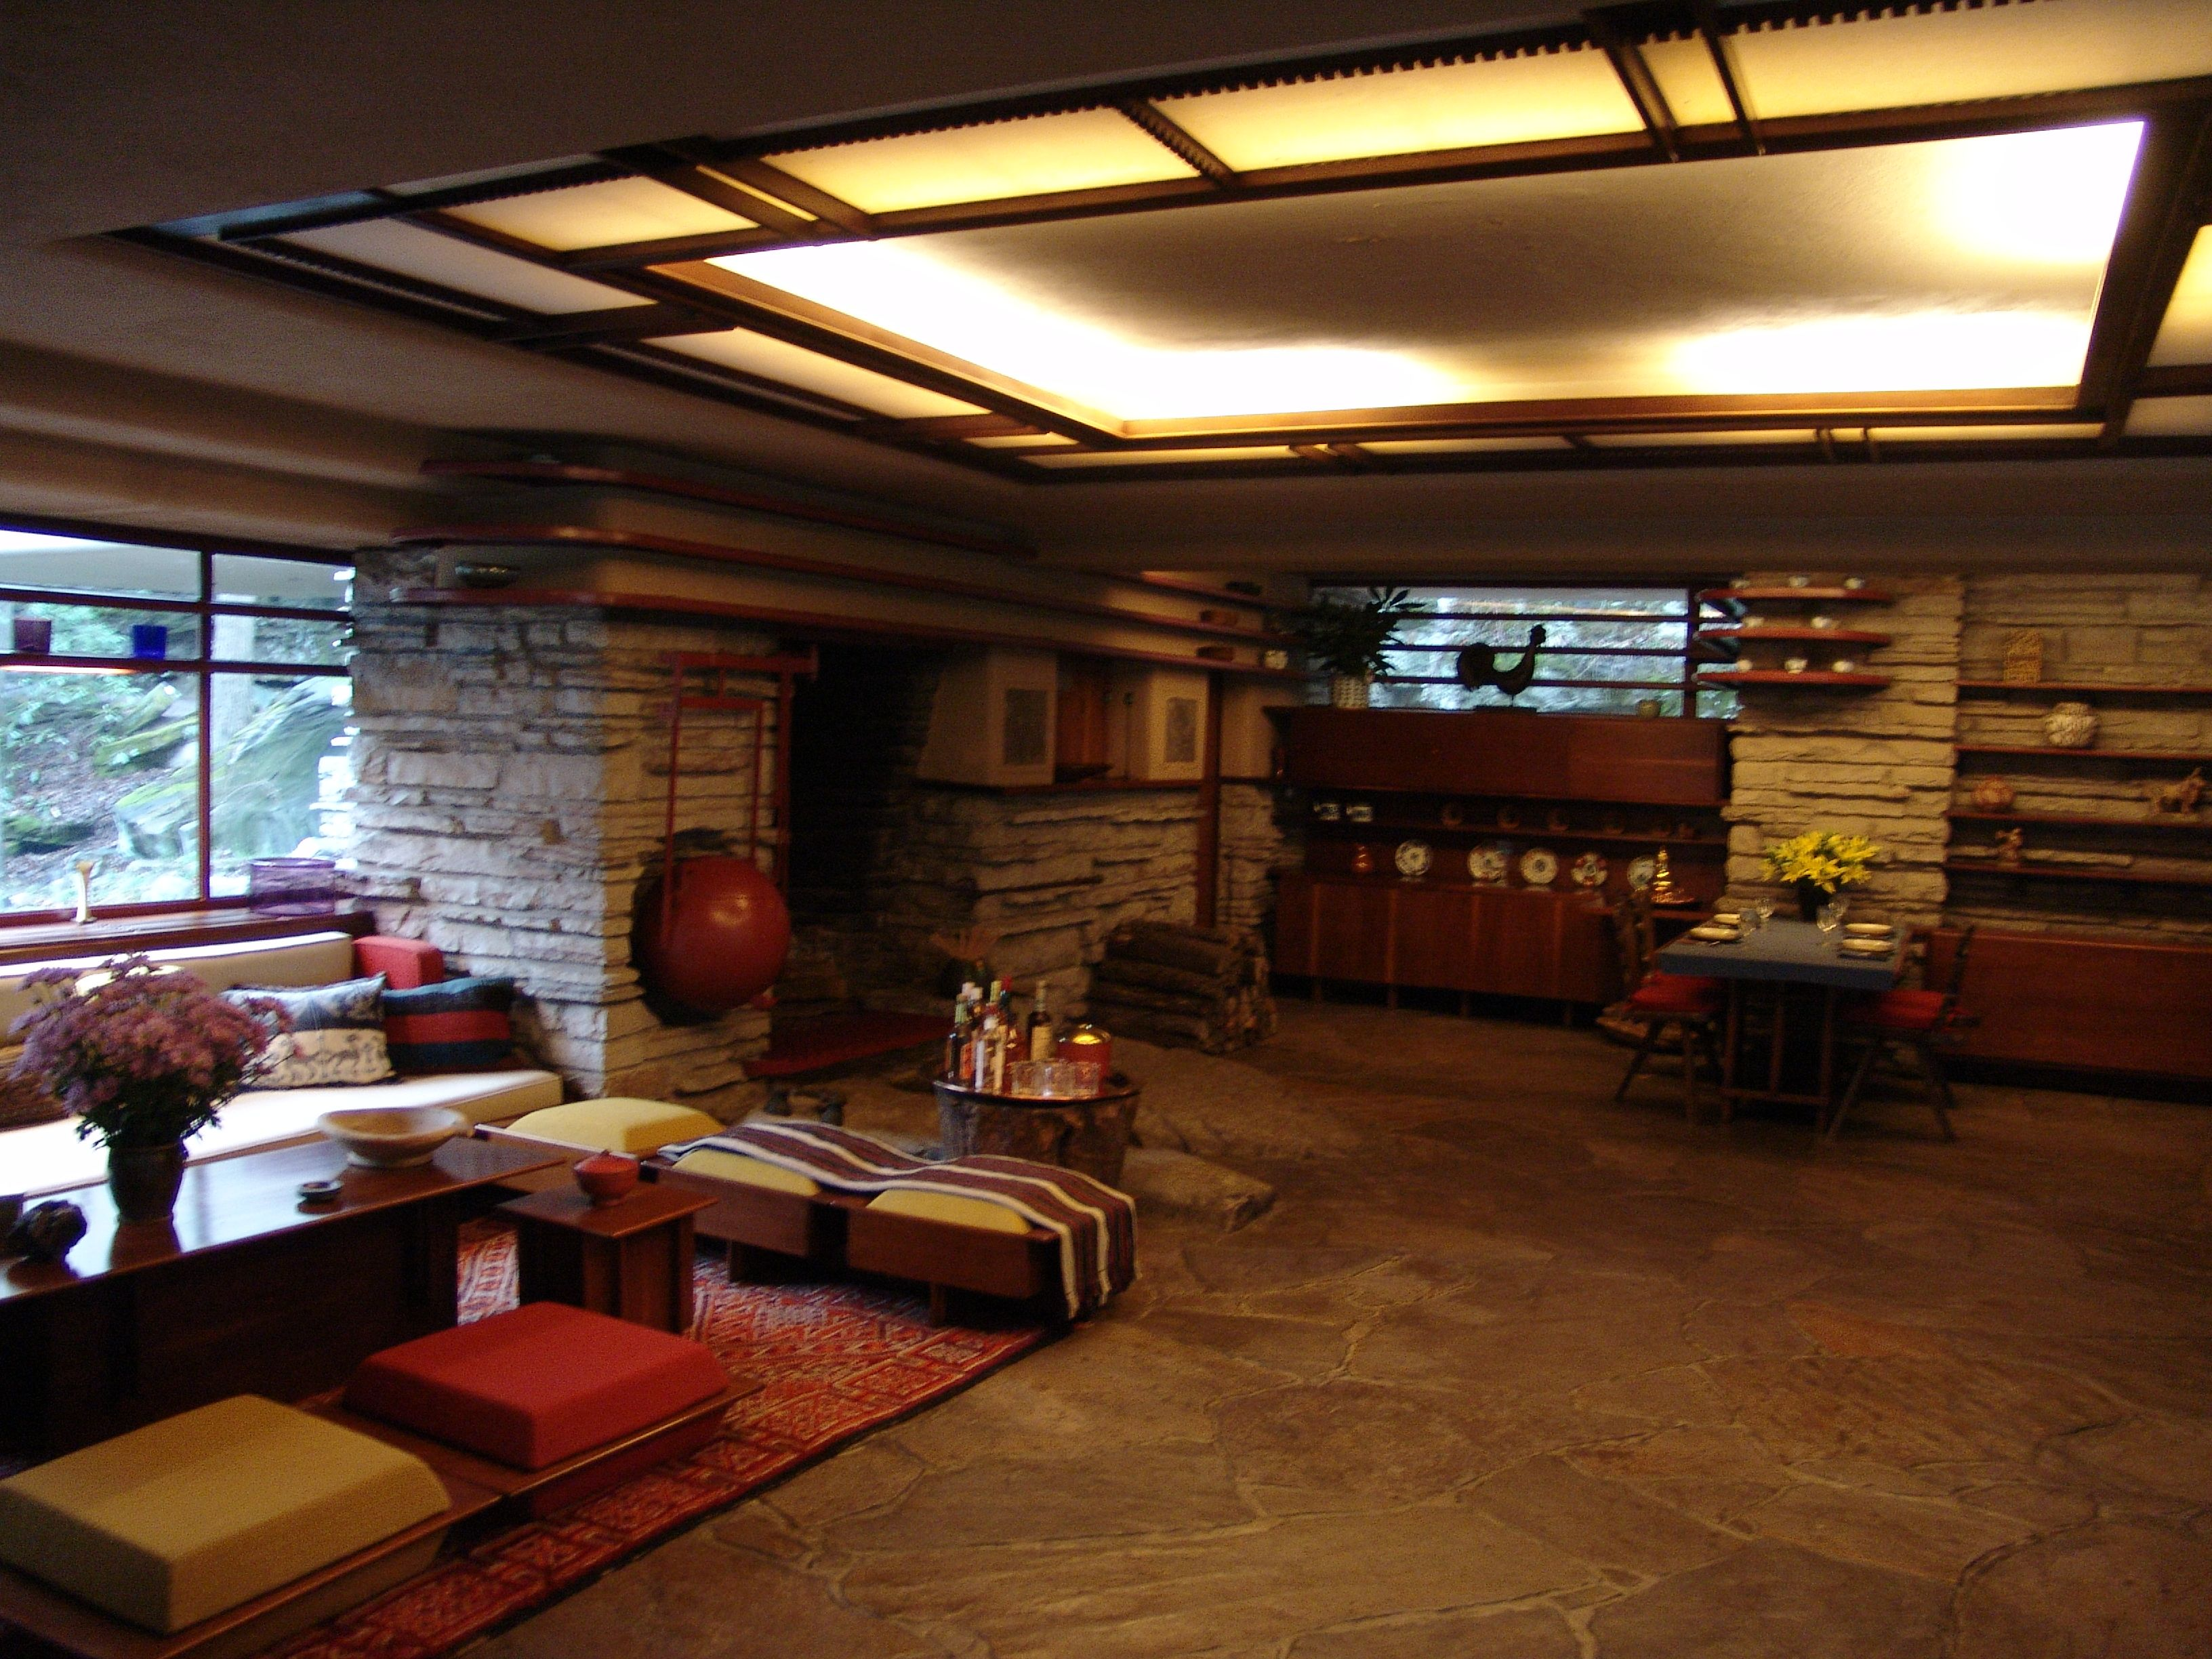 Stockman house interior frank lloyd wright - Architecture organique frank lloyd wright ...